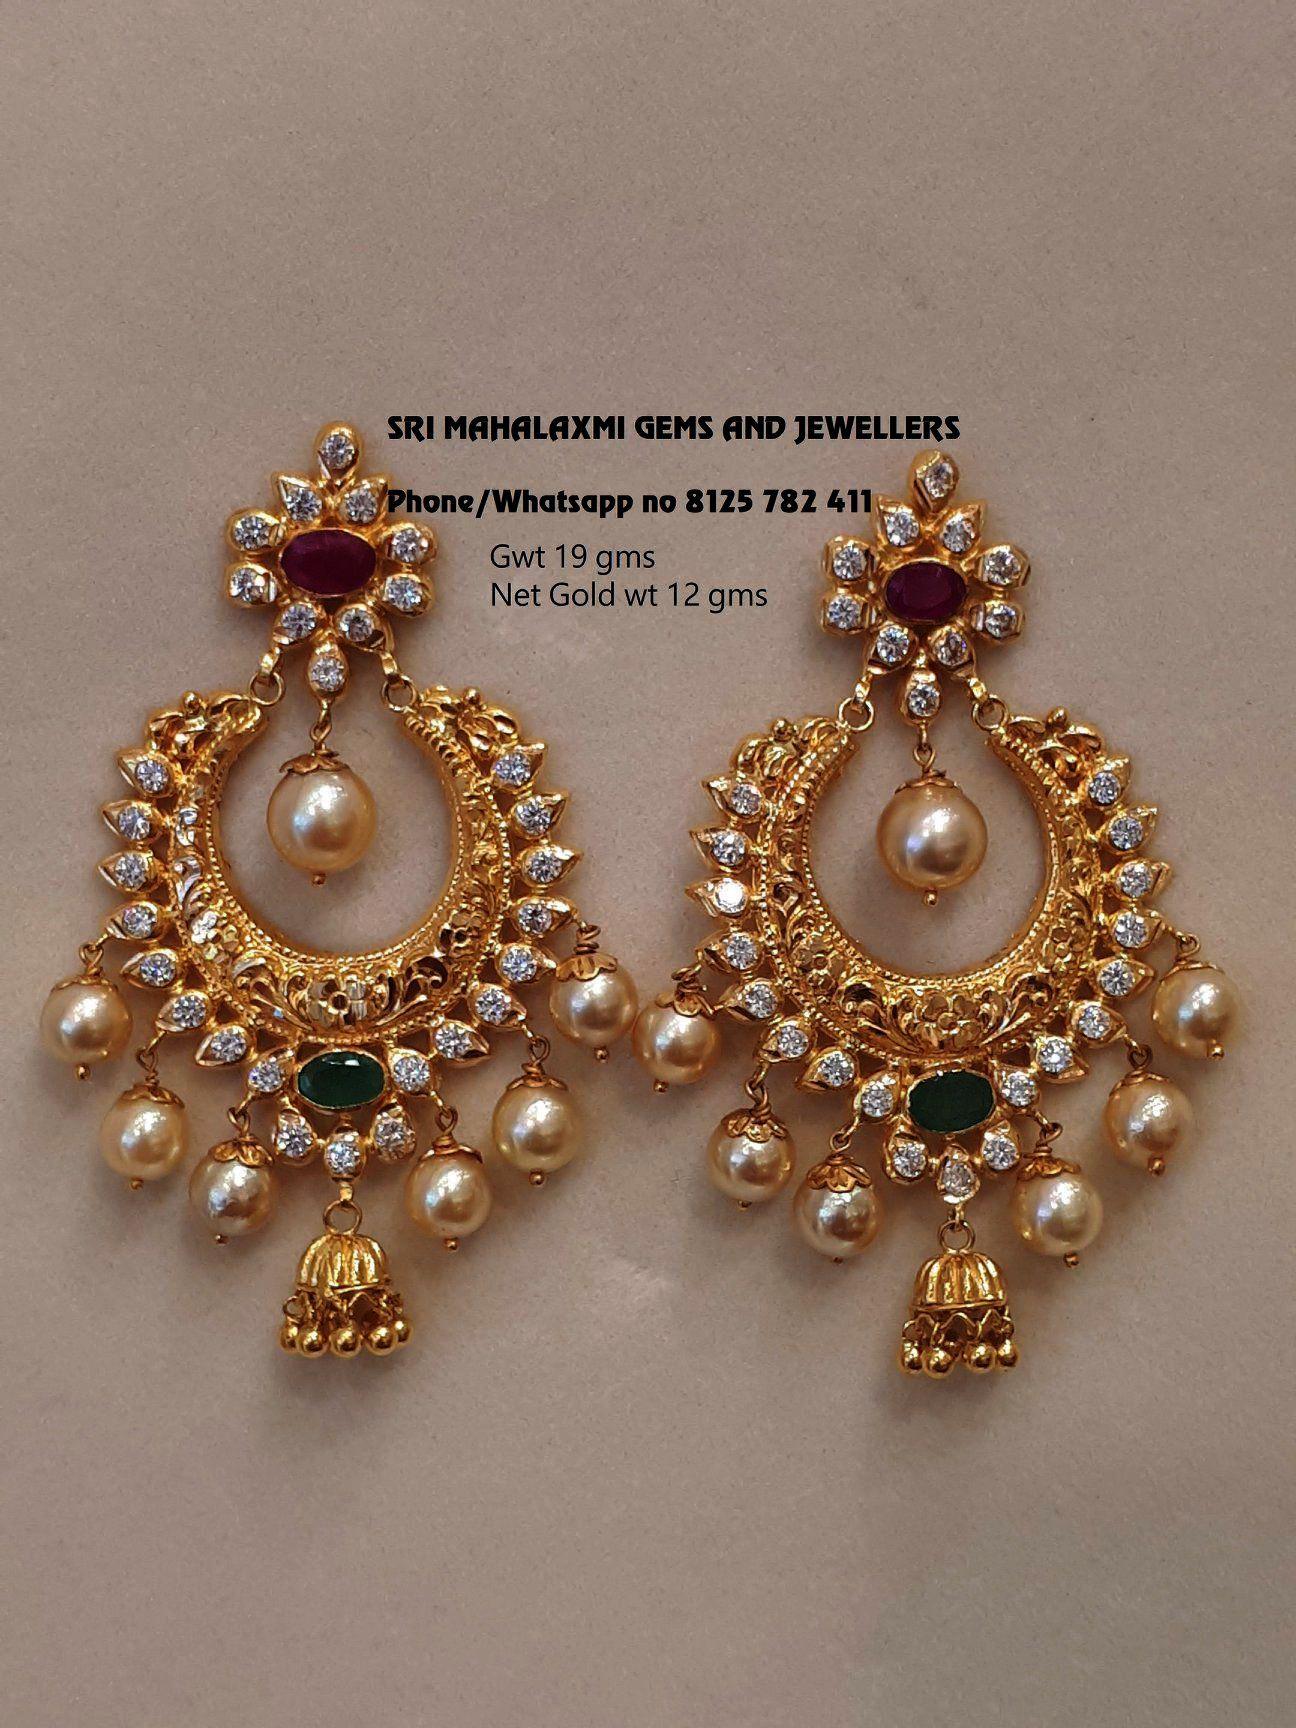 26++ Where to get jewelry near me info